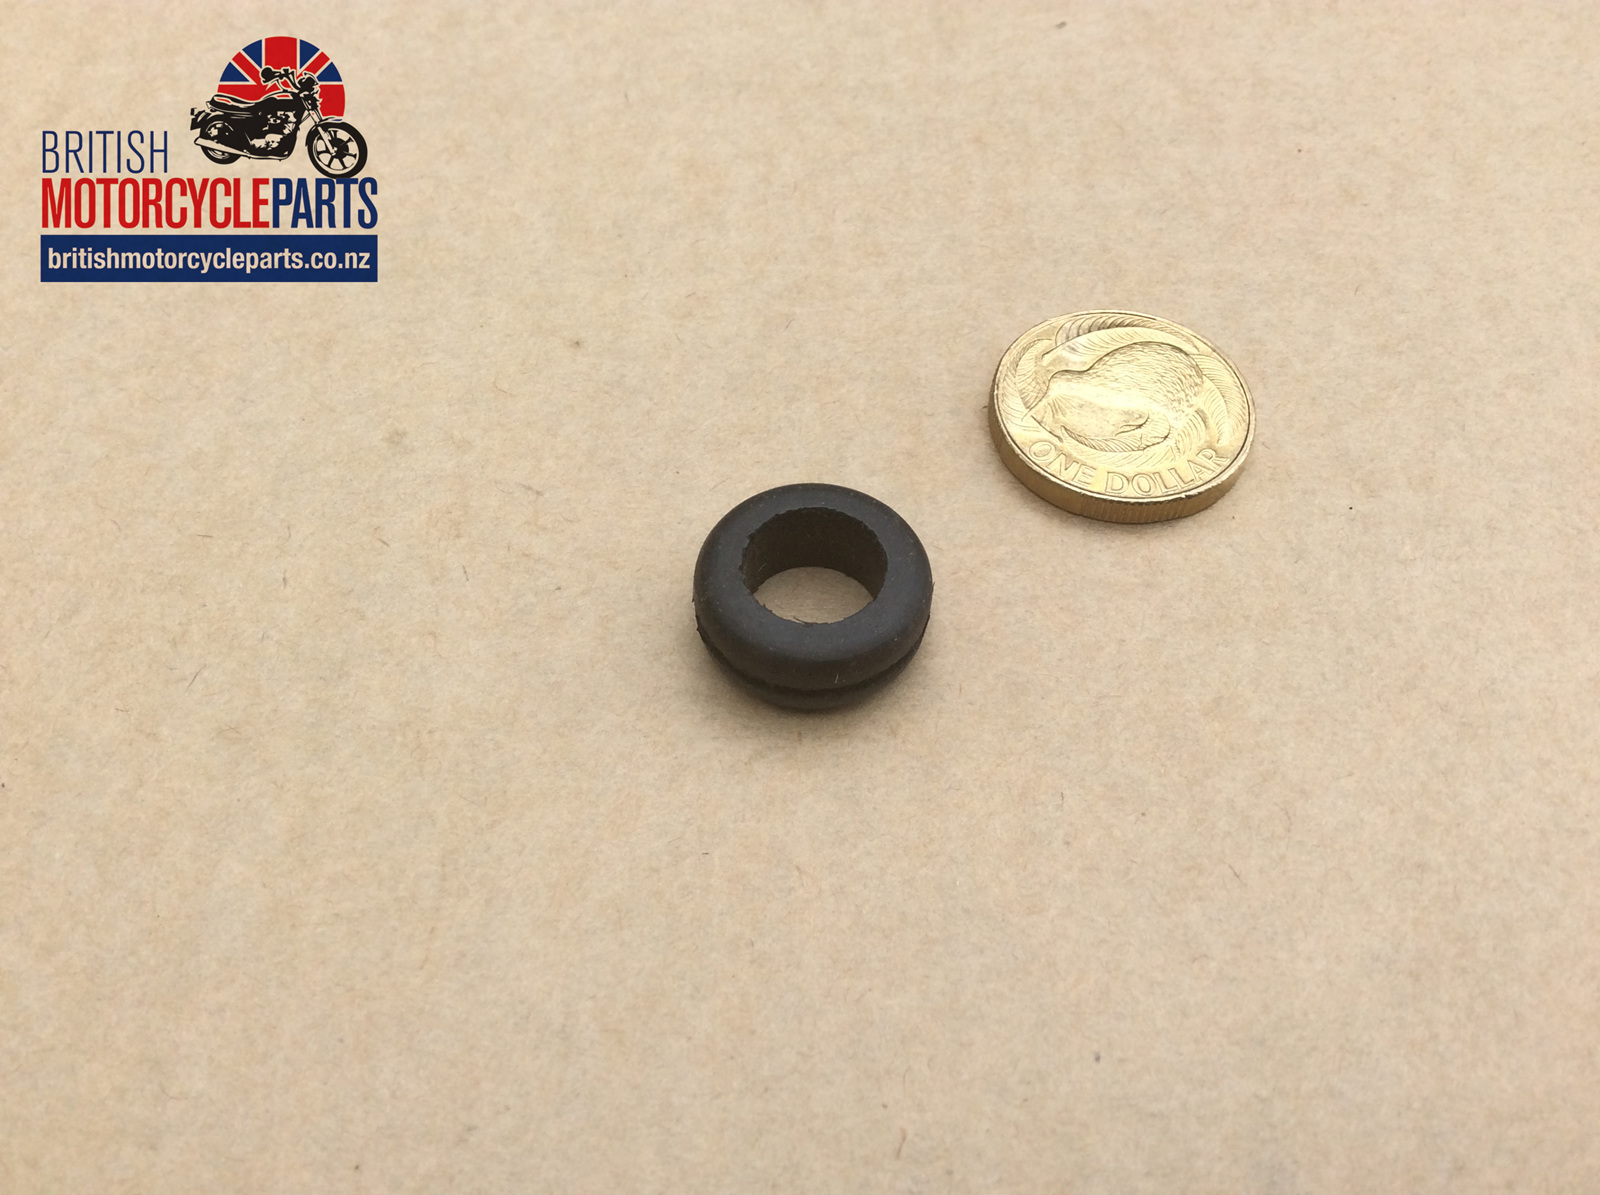 82 6784 rubber grommet british motorcycle parts ltd auckland nz